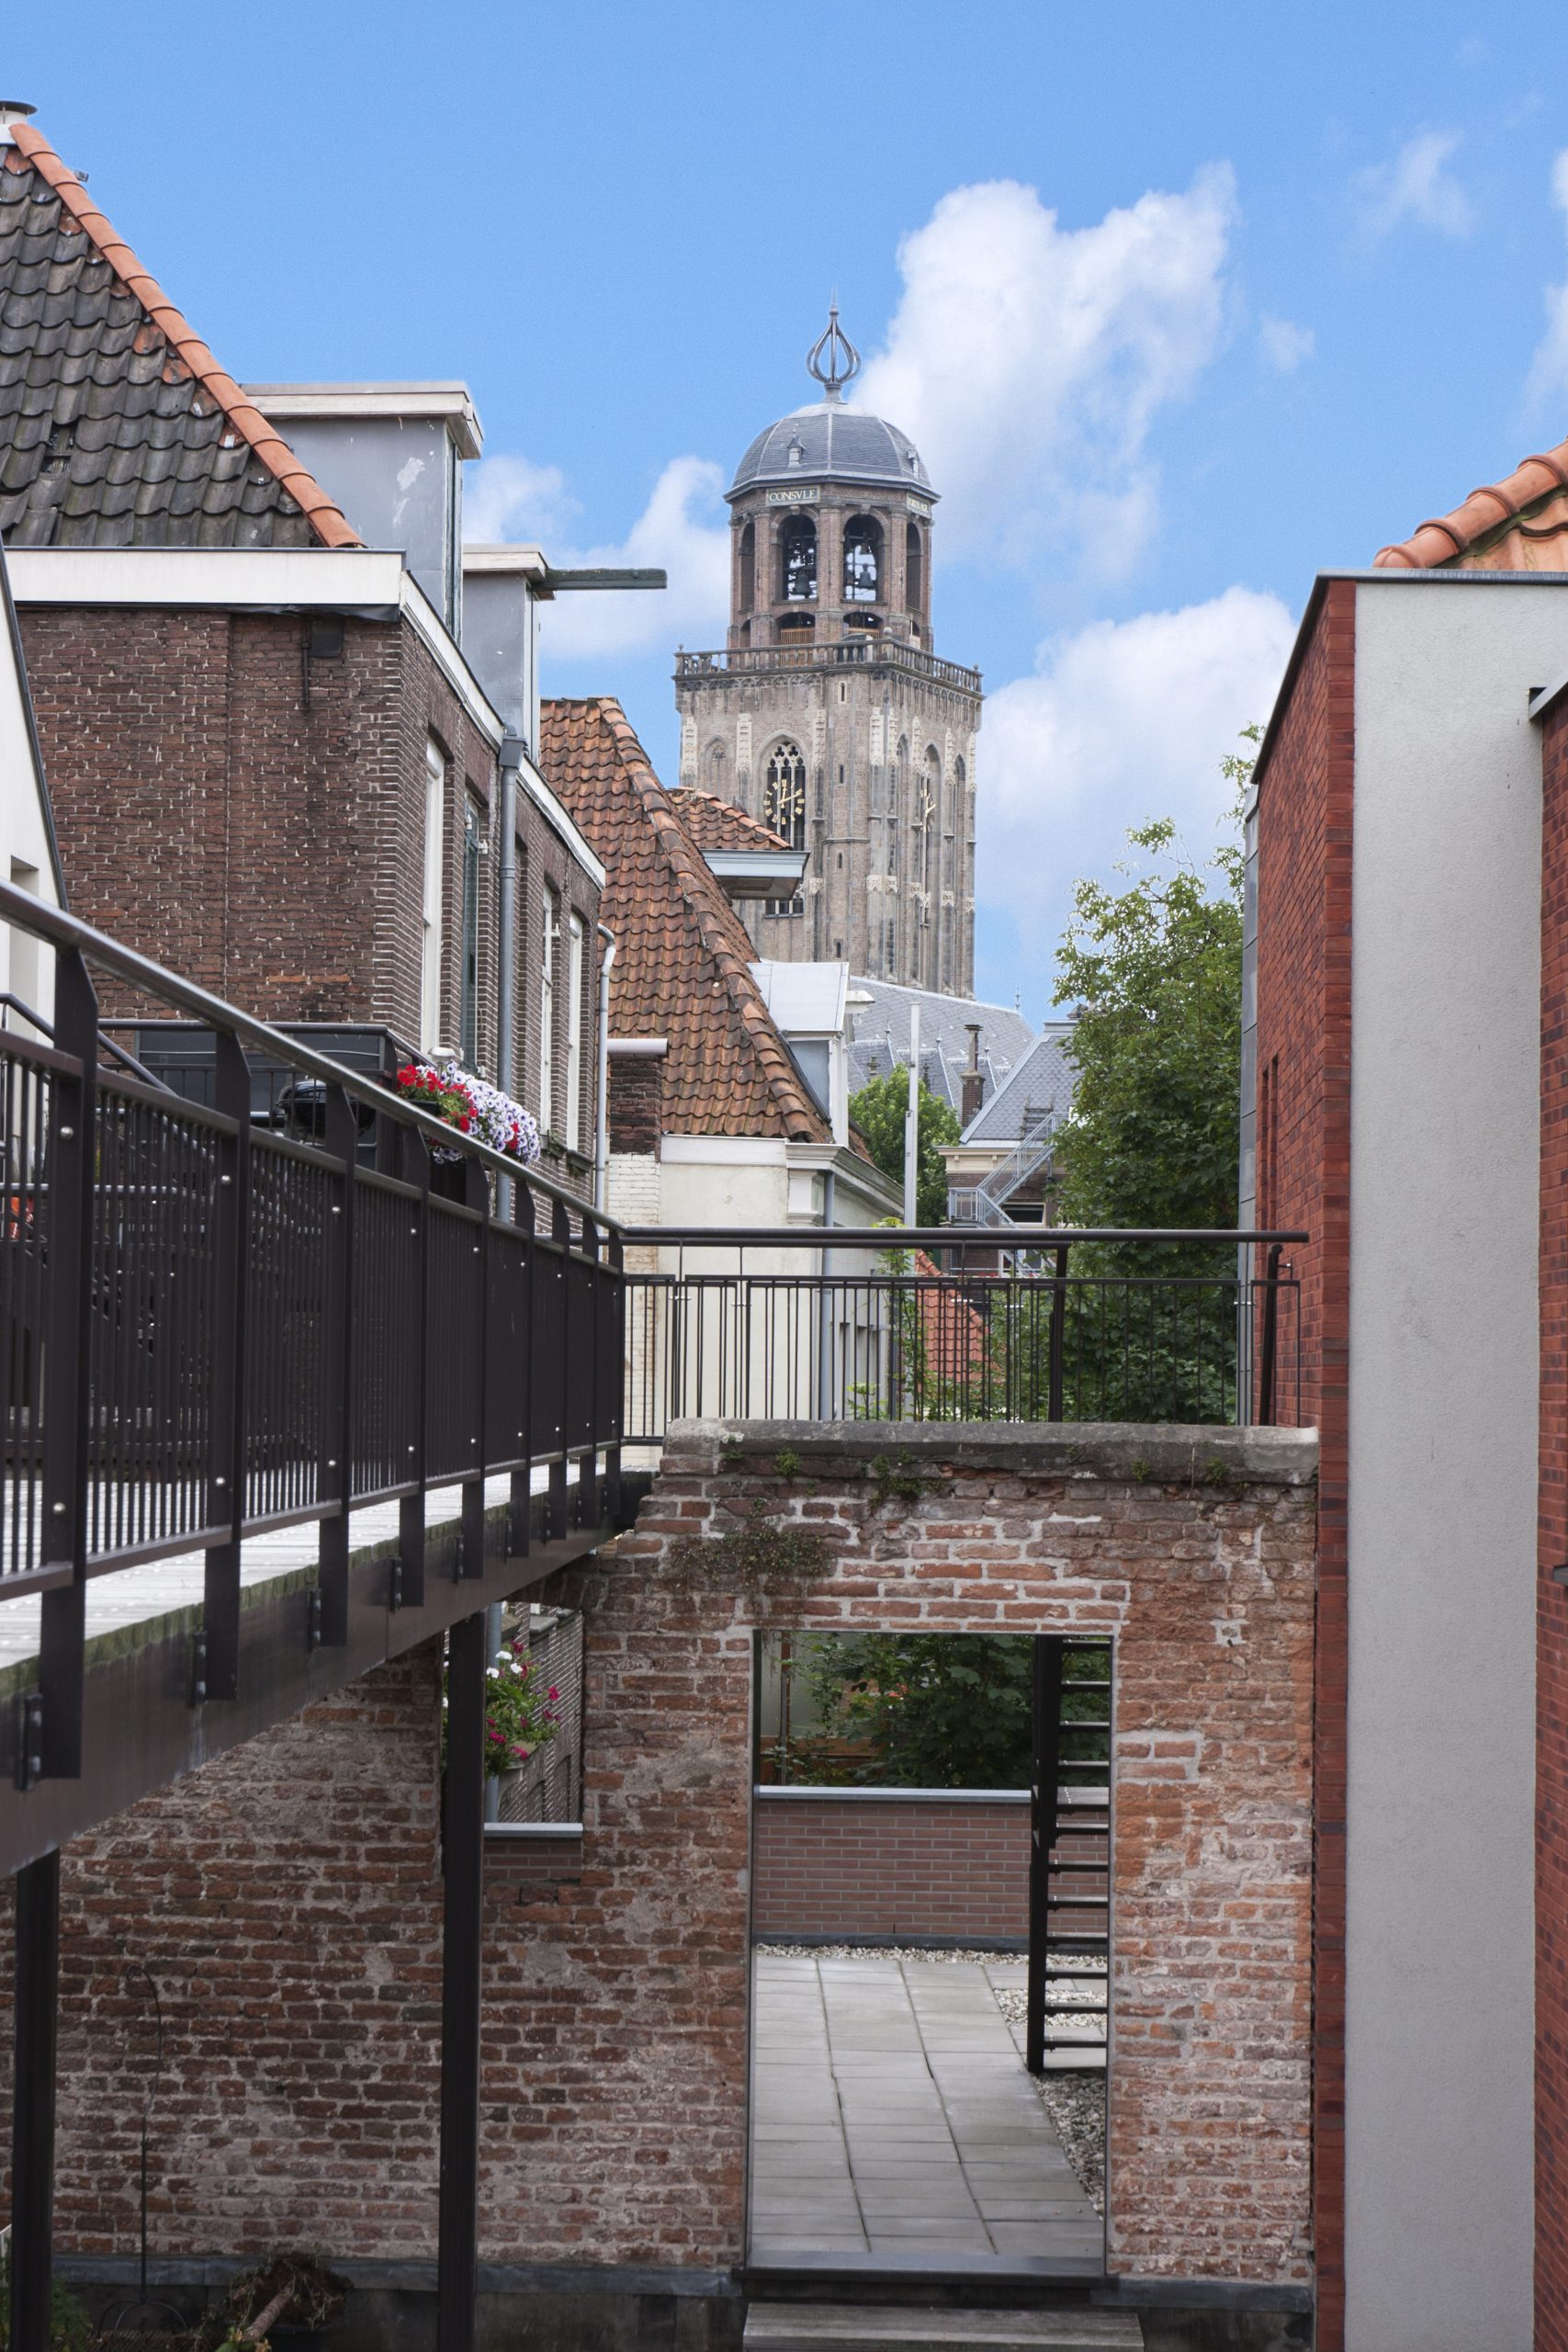 Binnenstad Deventer